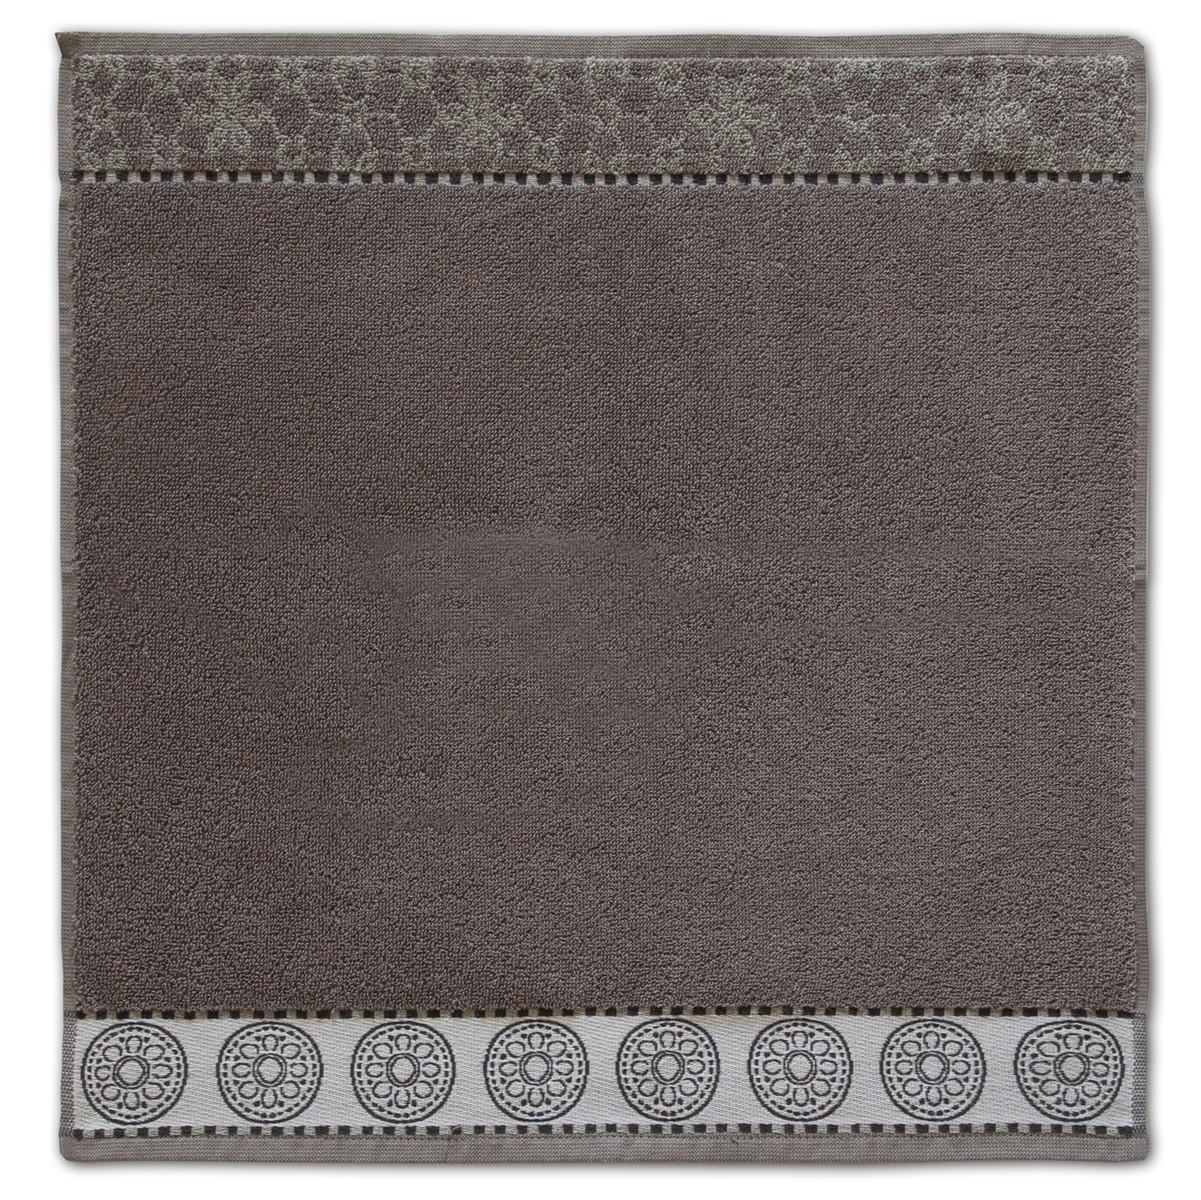 Keukendoek Lace | Grey | 50 x 55 cm